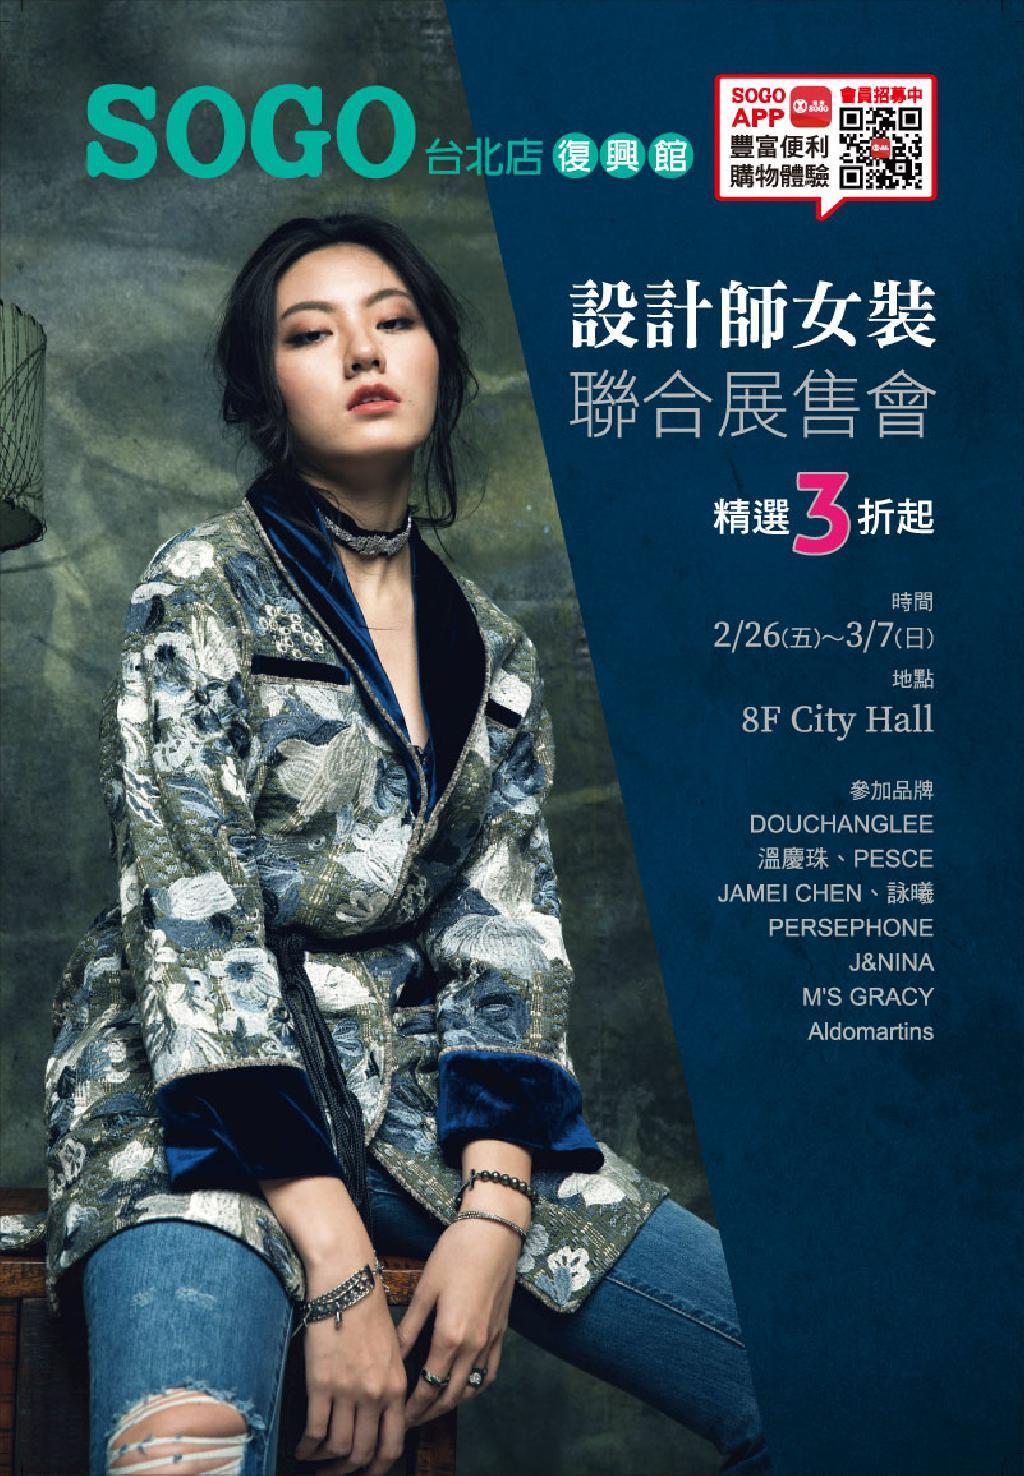 SOGO《台北復興館》「設計師女裝聯合展售會 精選3折起」 【2021/3/7 止】